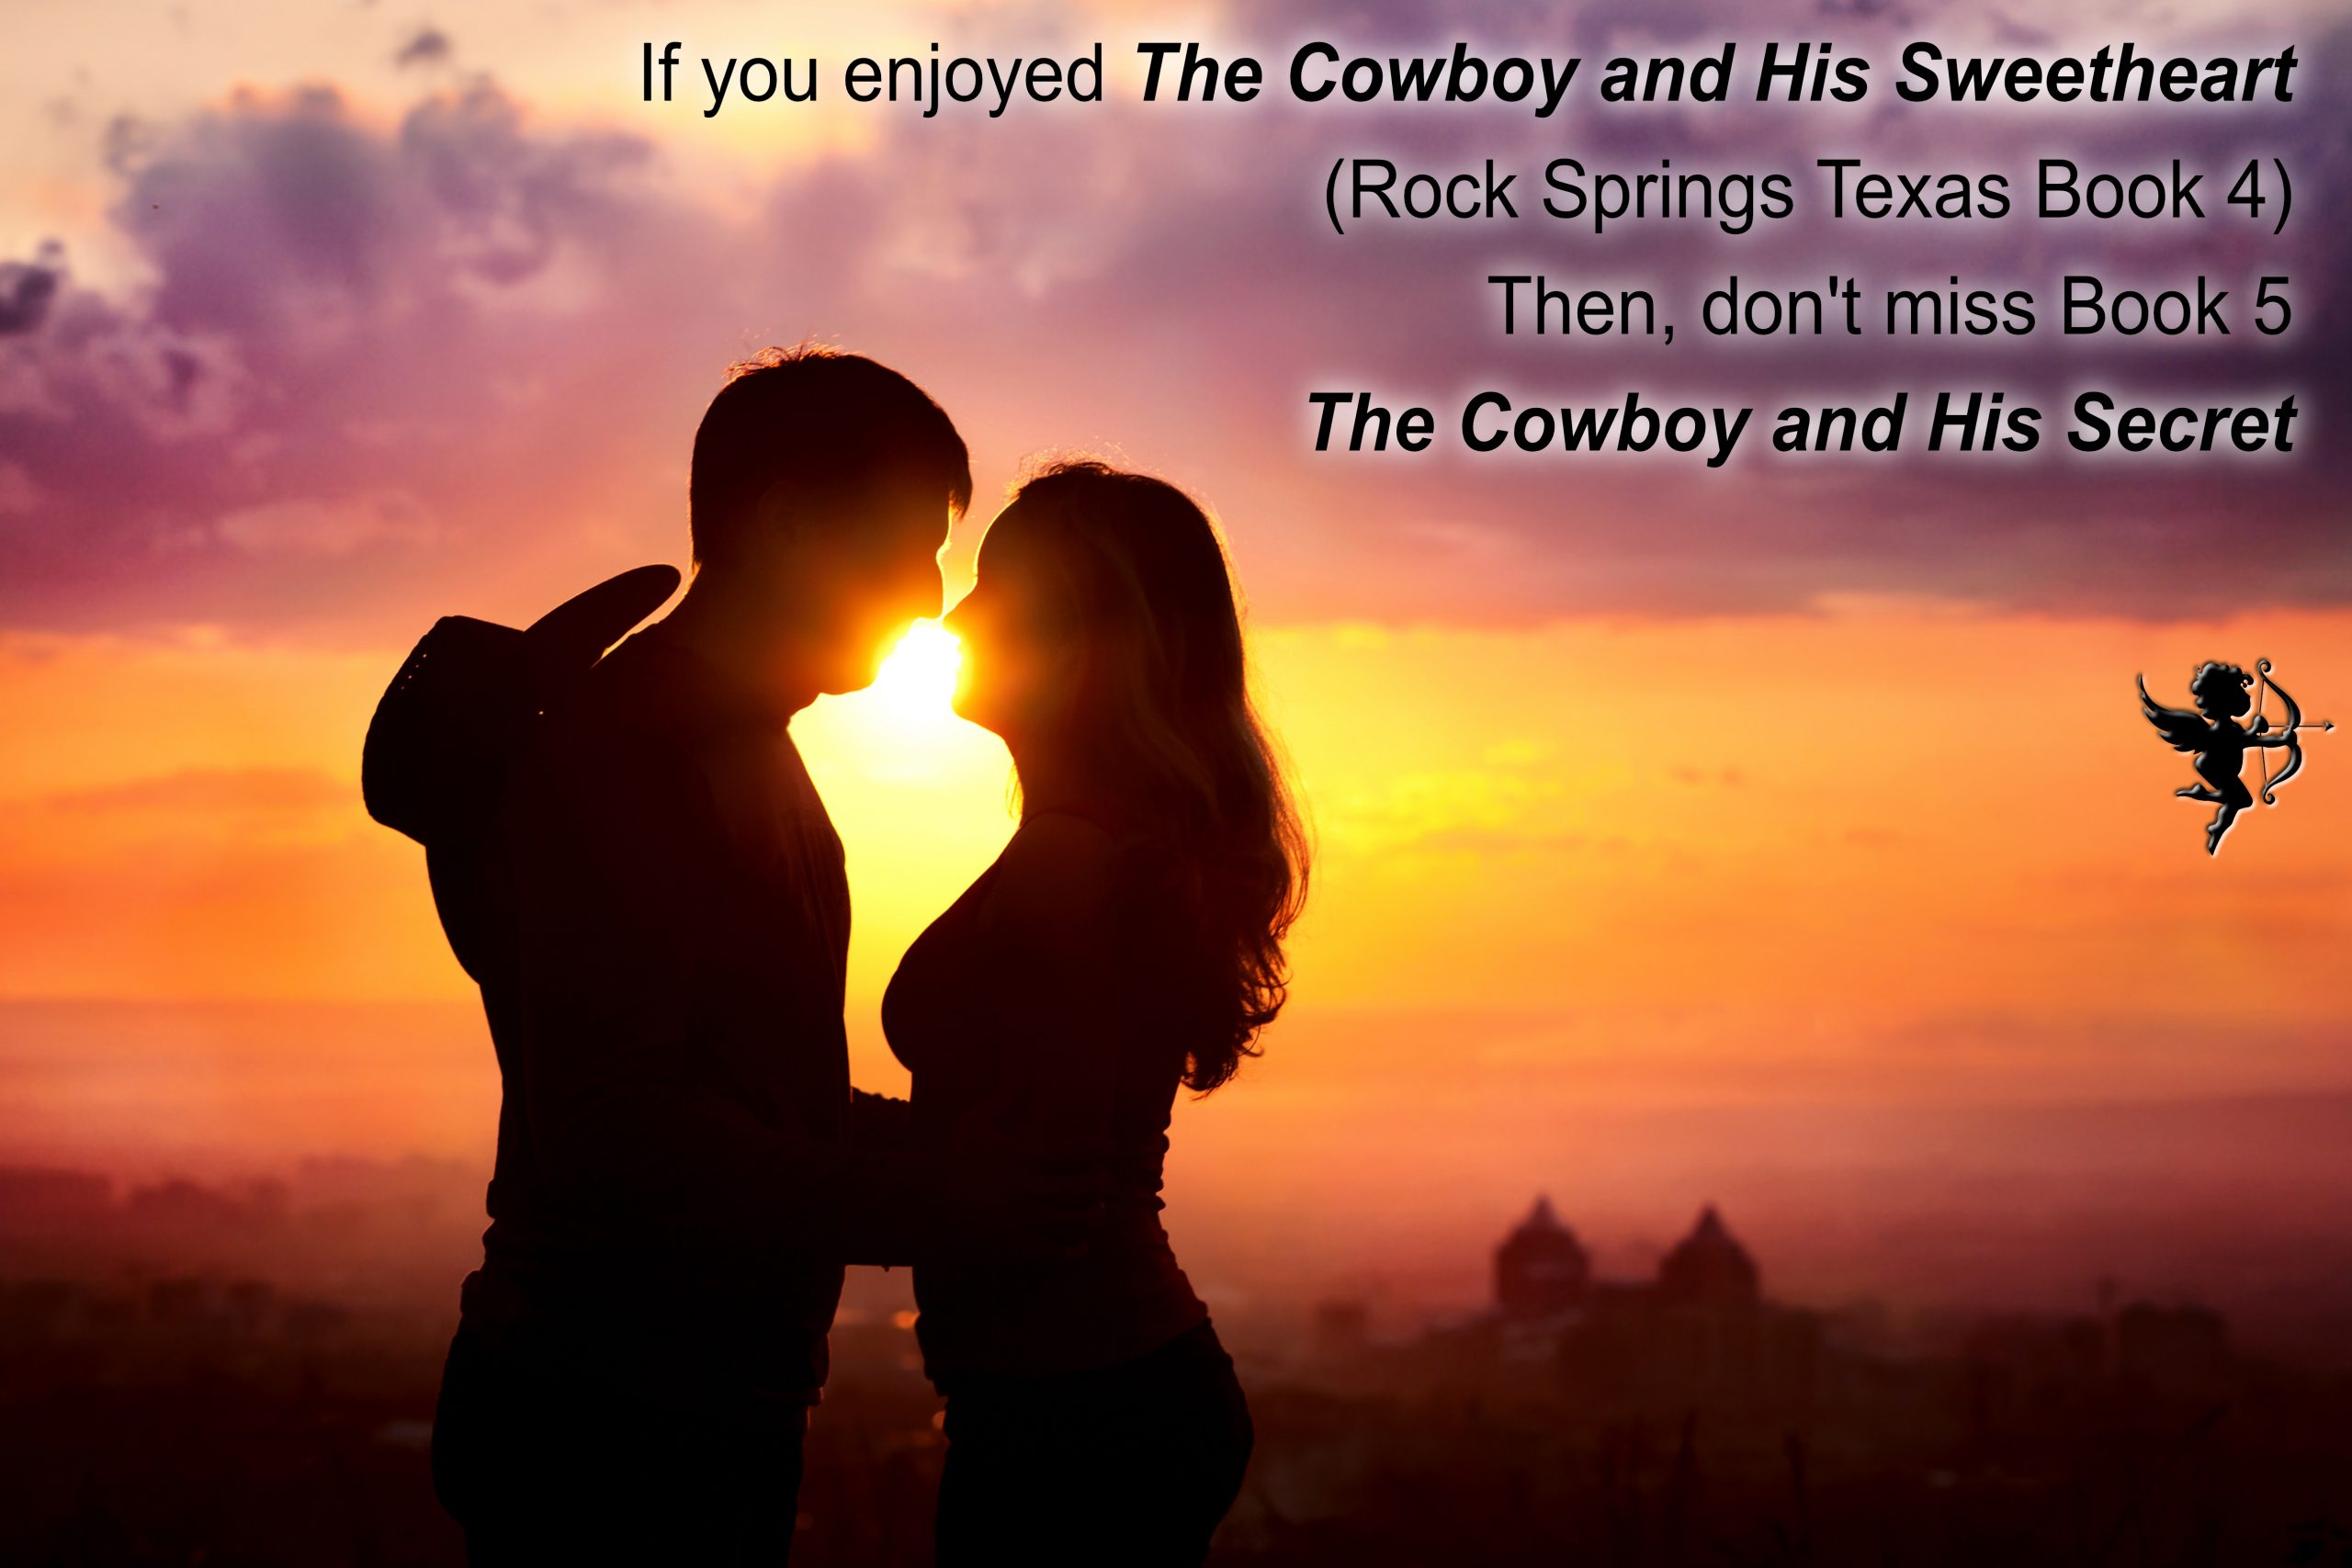 The Cowboy and His Secret - Next